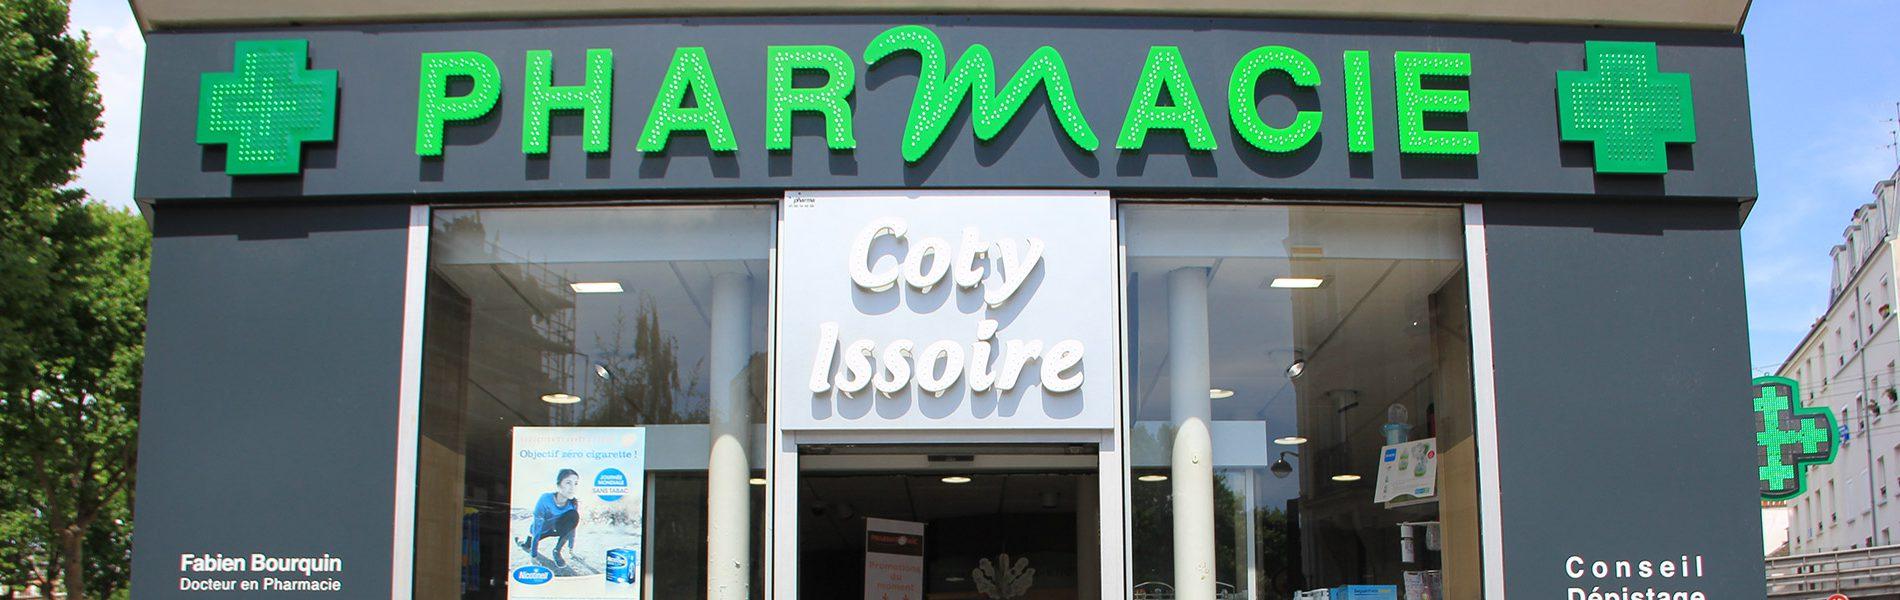 Pharmacie COTY ISSOIRE - Image Homepage 1